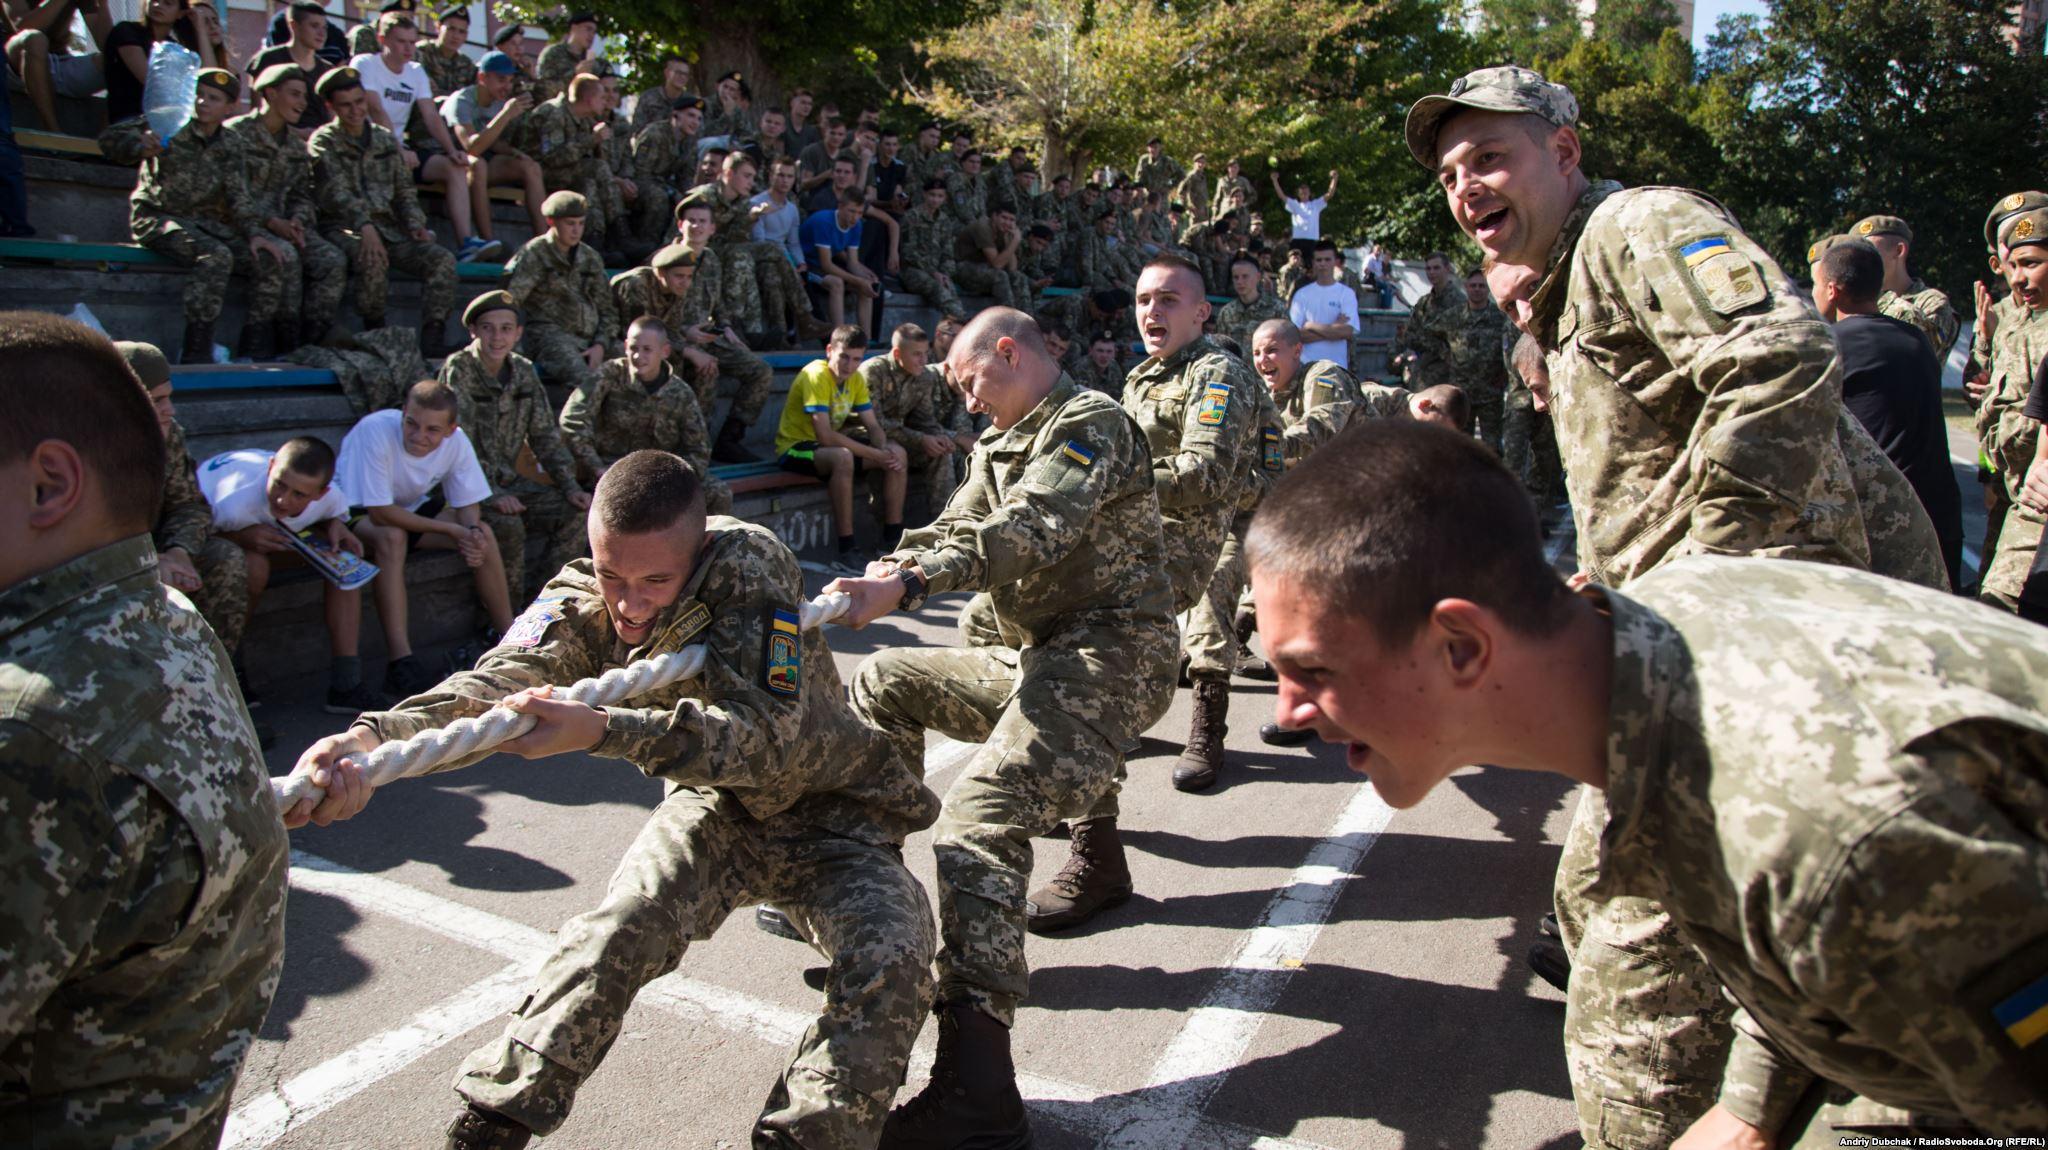 Під час змагань із перетягування каната (фотограф Андрей Дубчак / Andriy Dubchak)